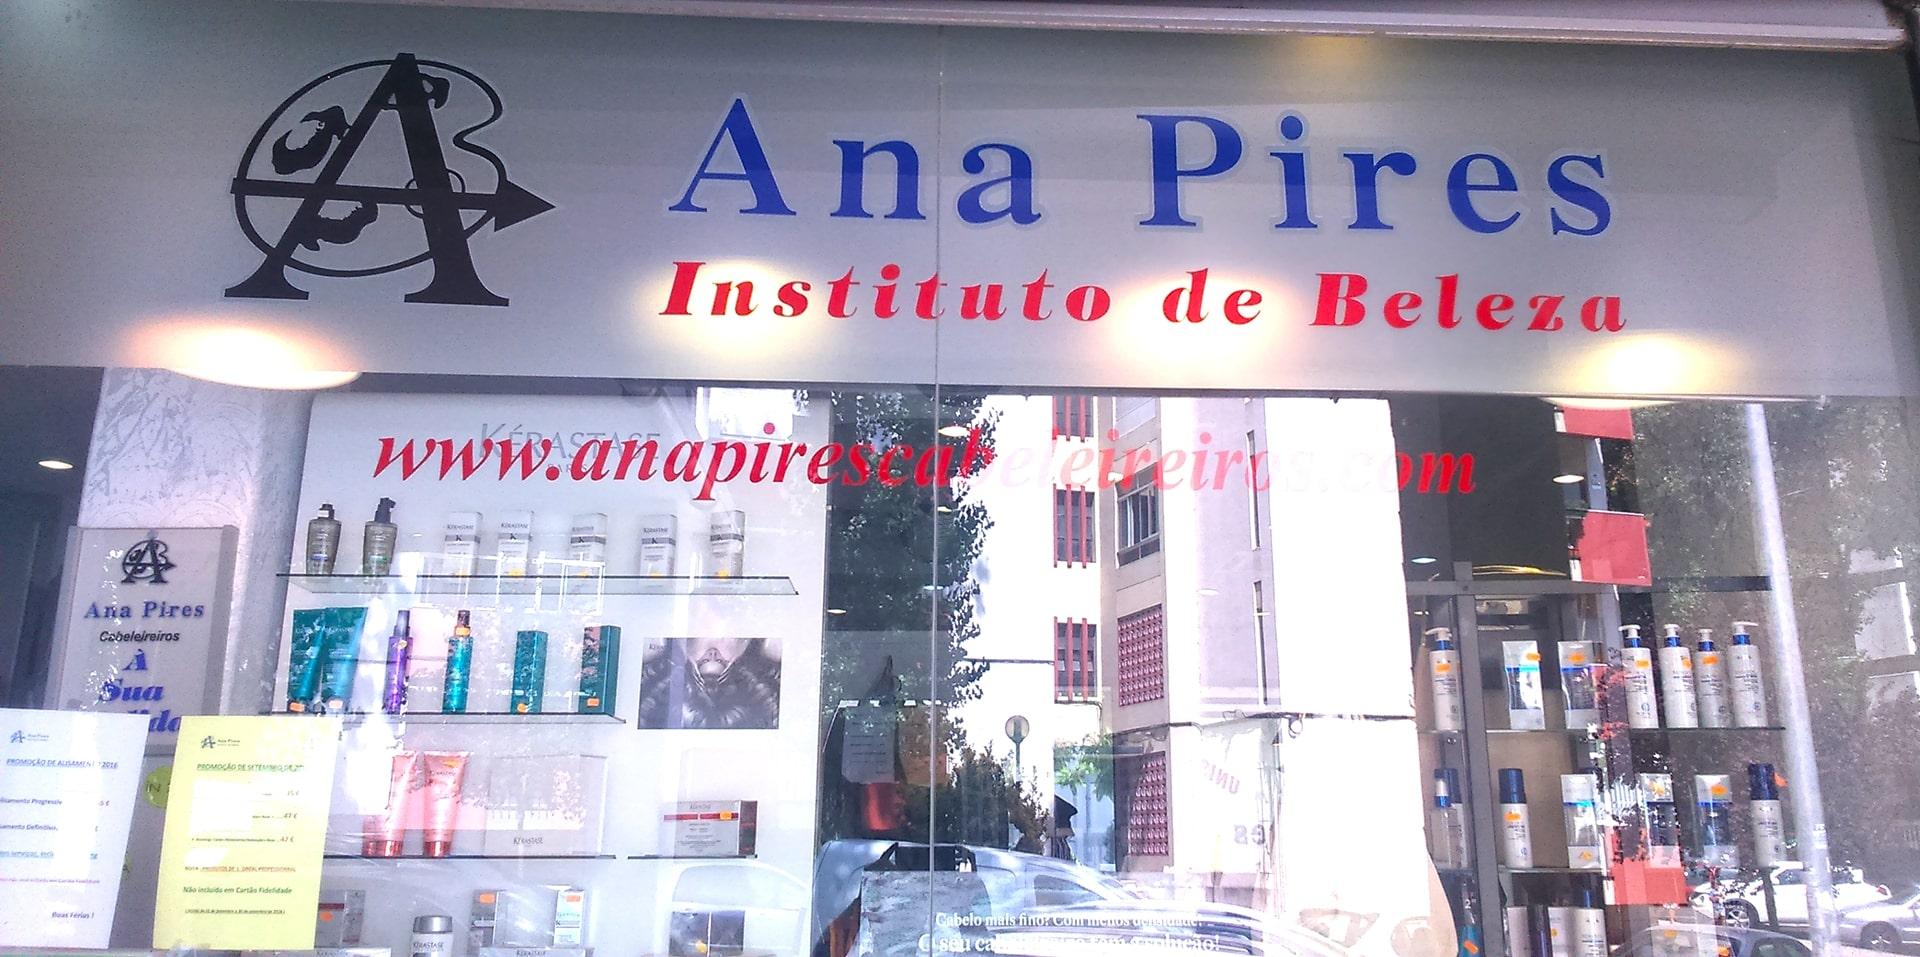 ana-pires-espaco02